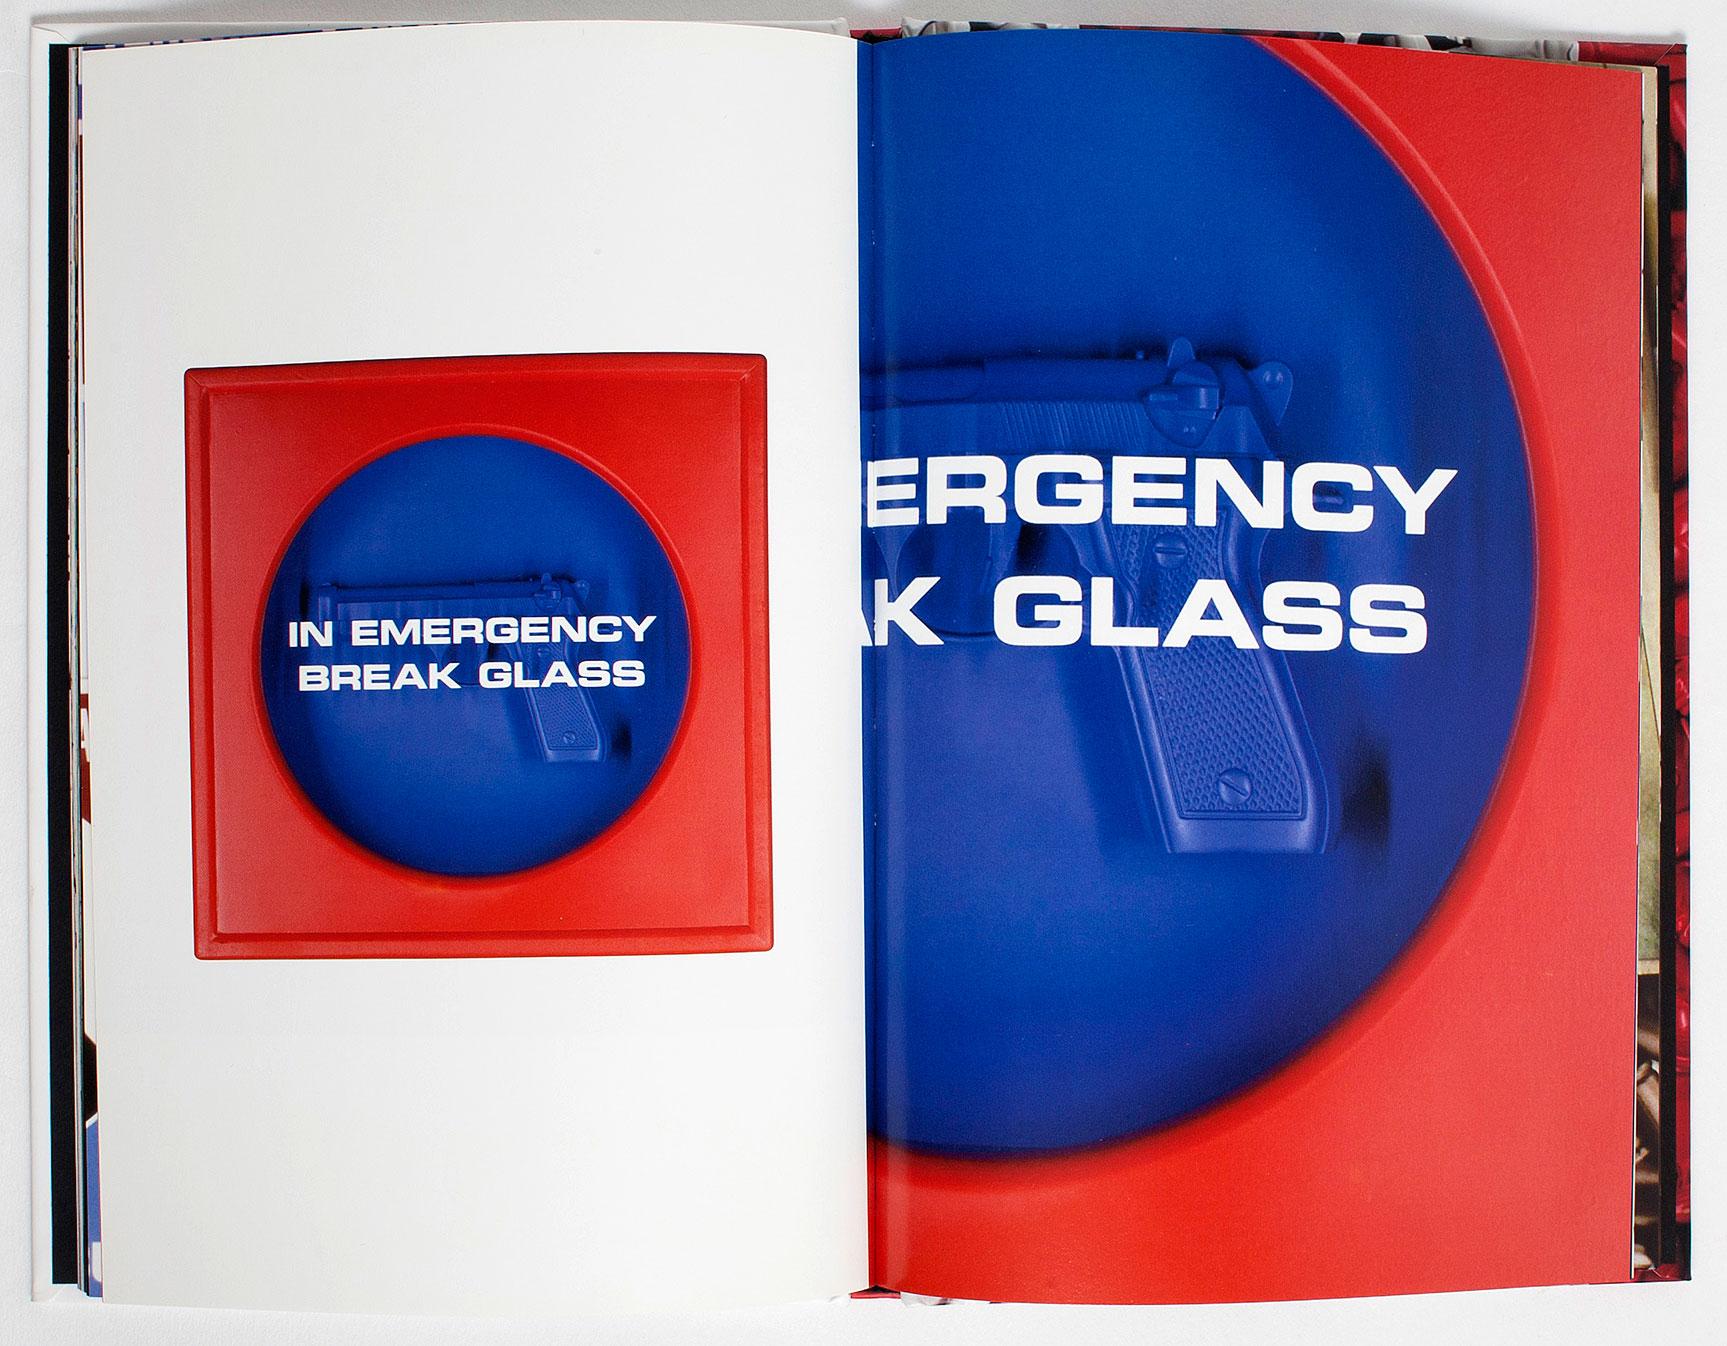 epm-print-management-bristol-ben-turnball-art-books-3.jpg